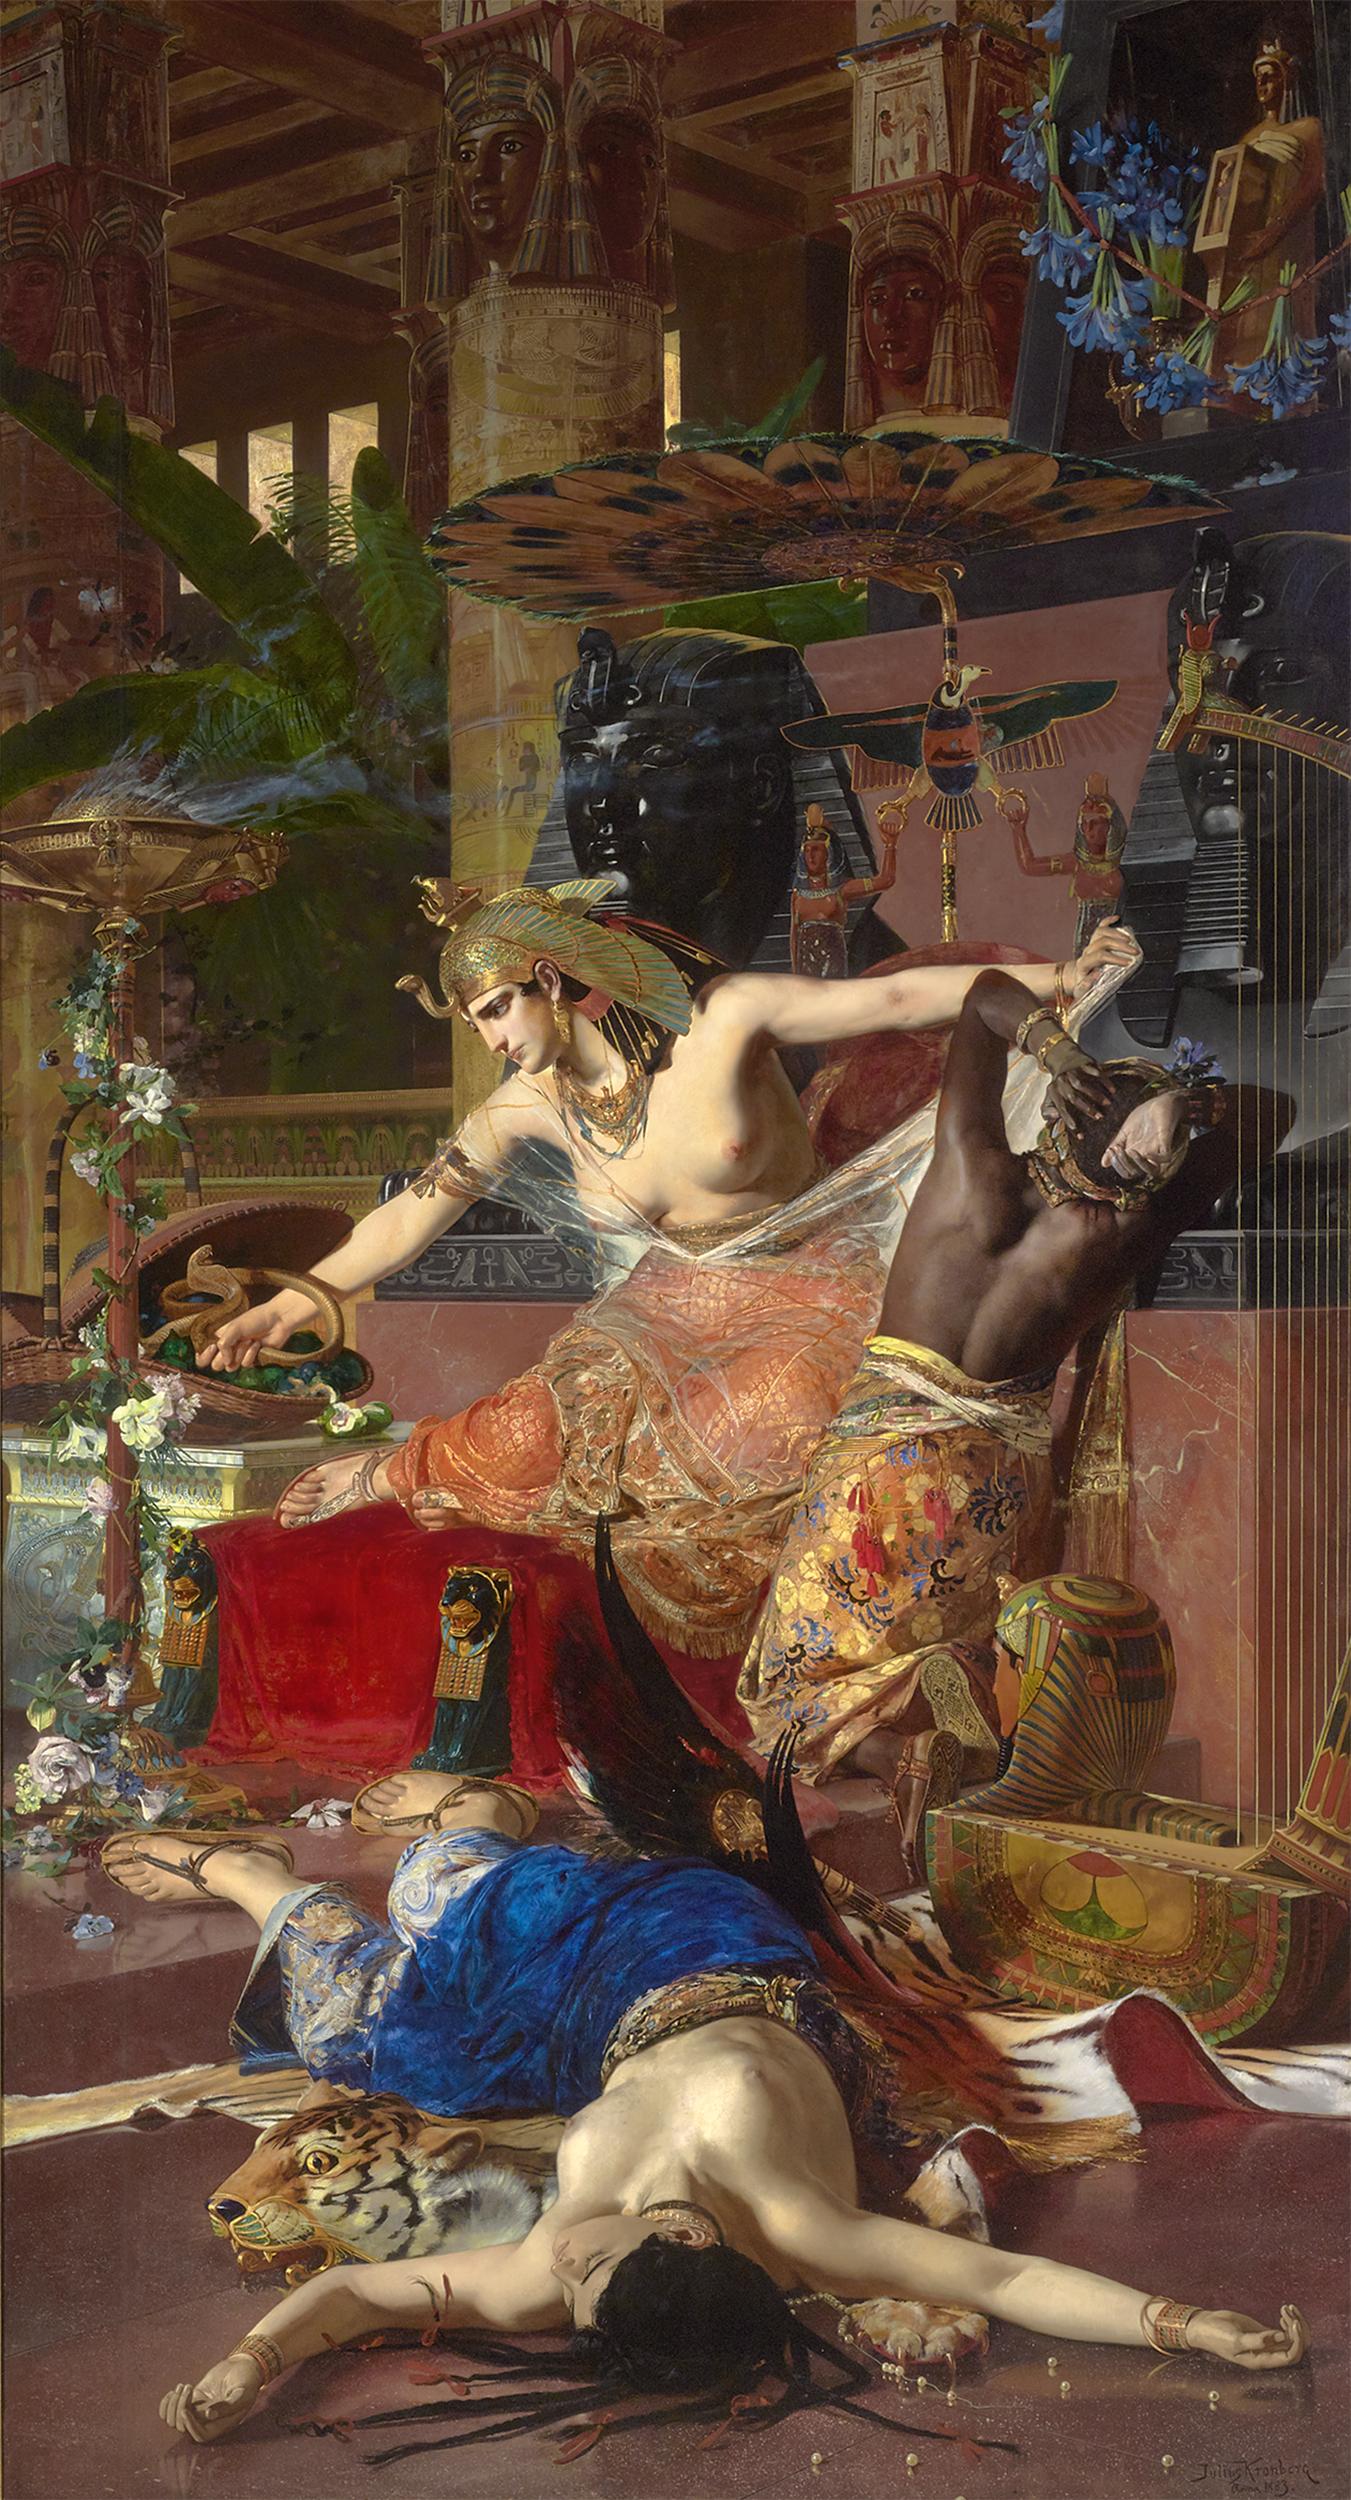 FLAUNT-MS Rau-Julius Kronberg- Cleopatra.png